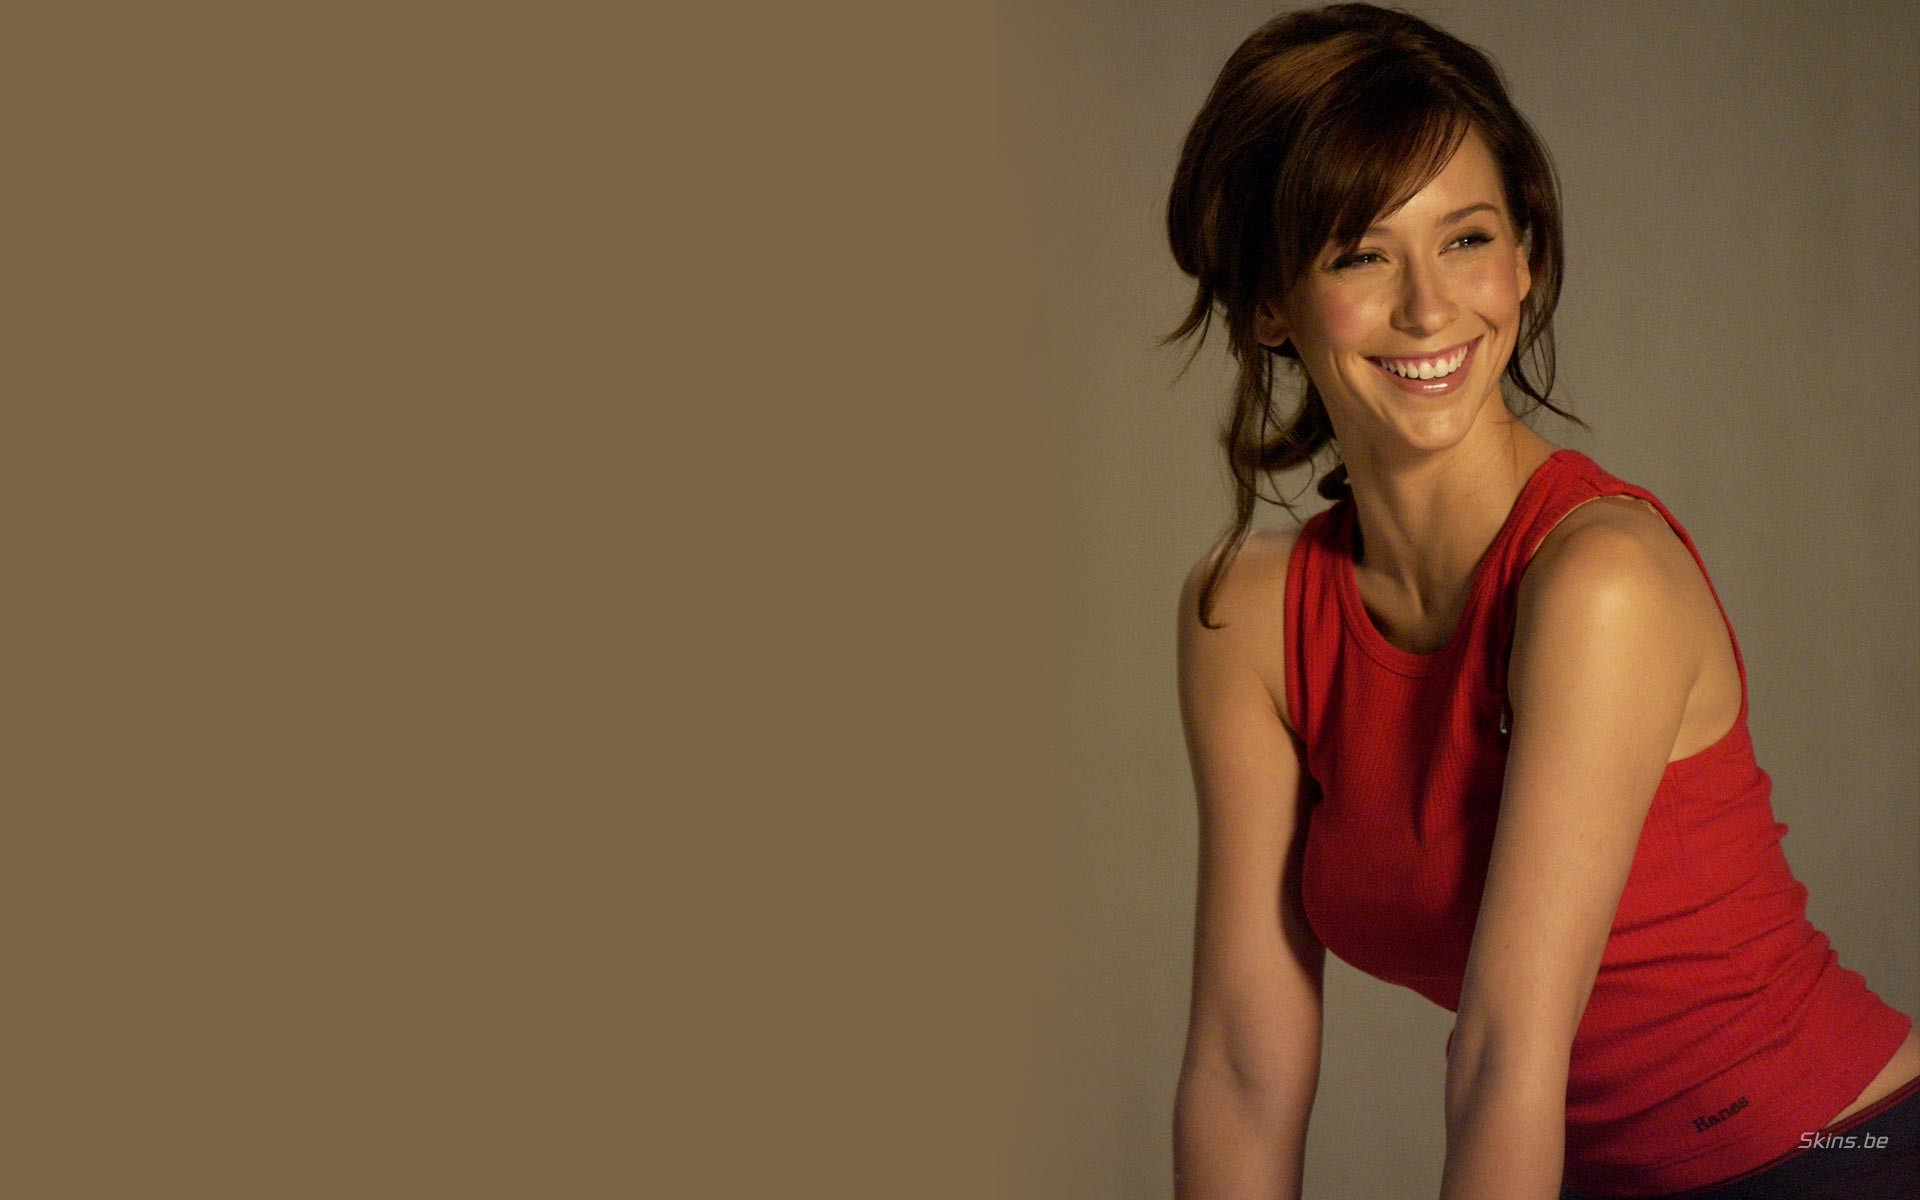 Jennifer Love Hewitt sonriendo - 1920x1200